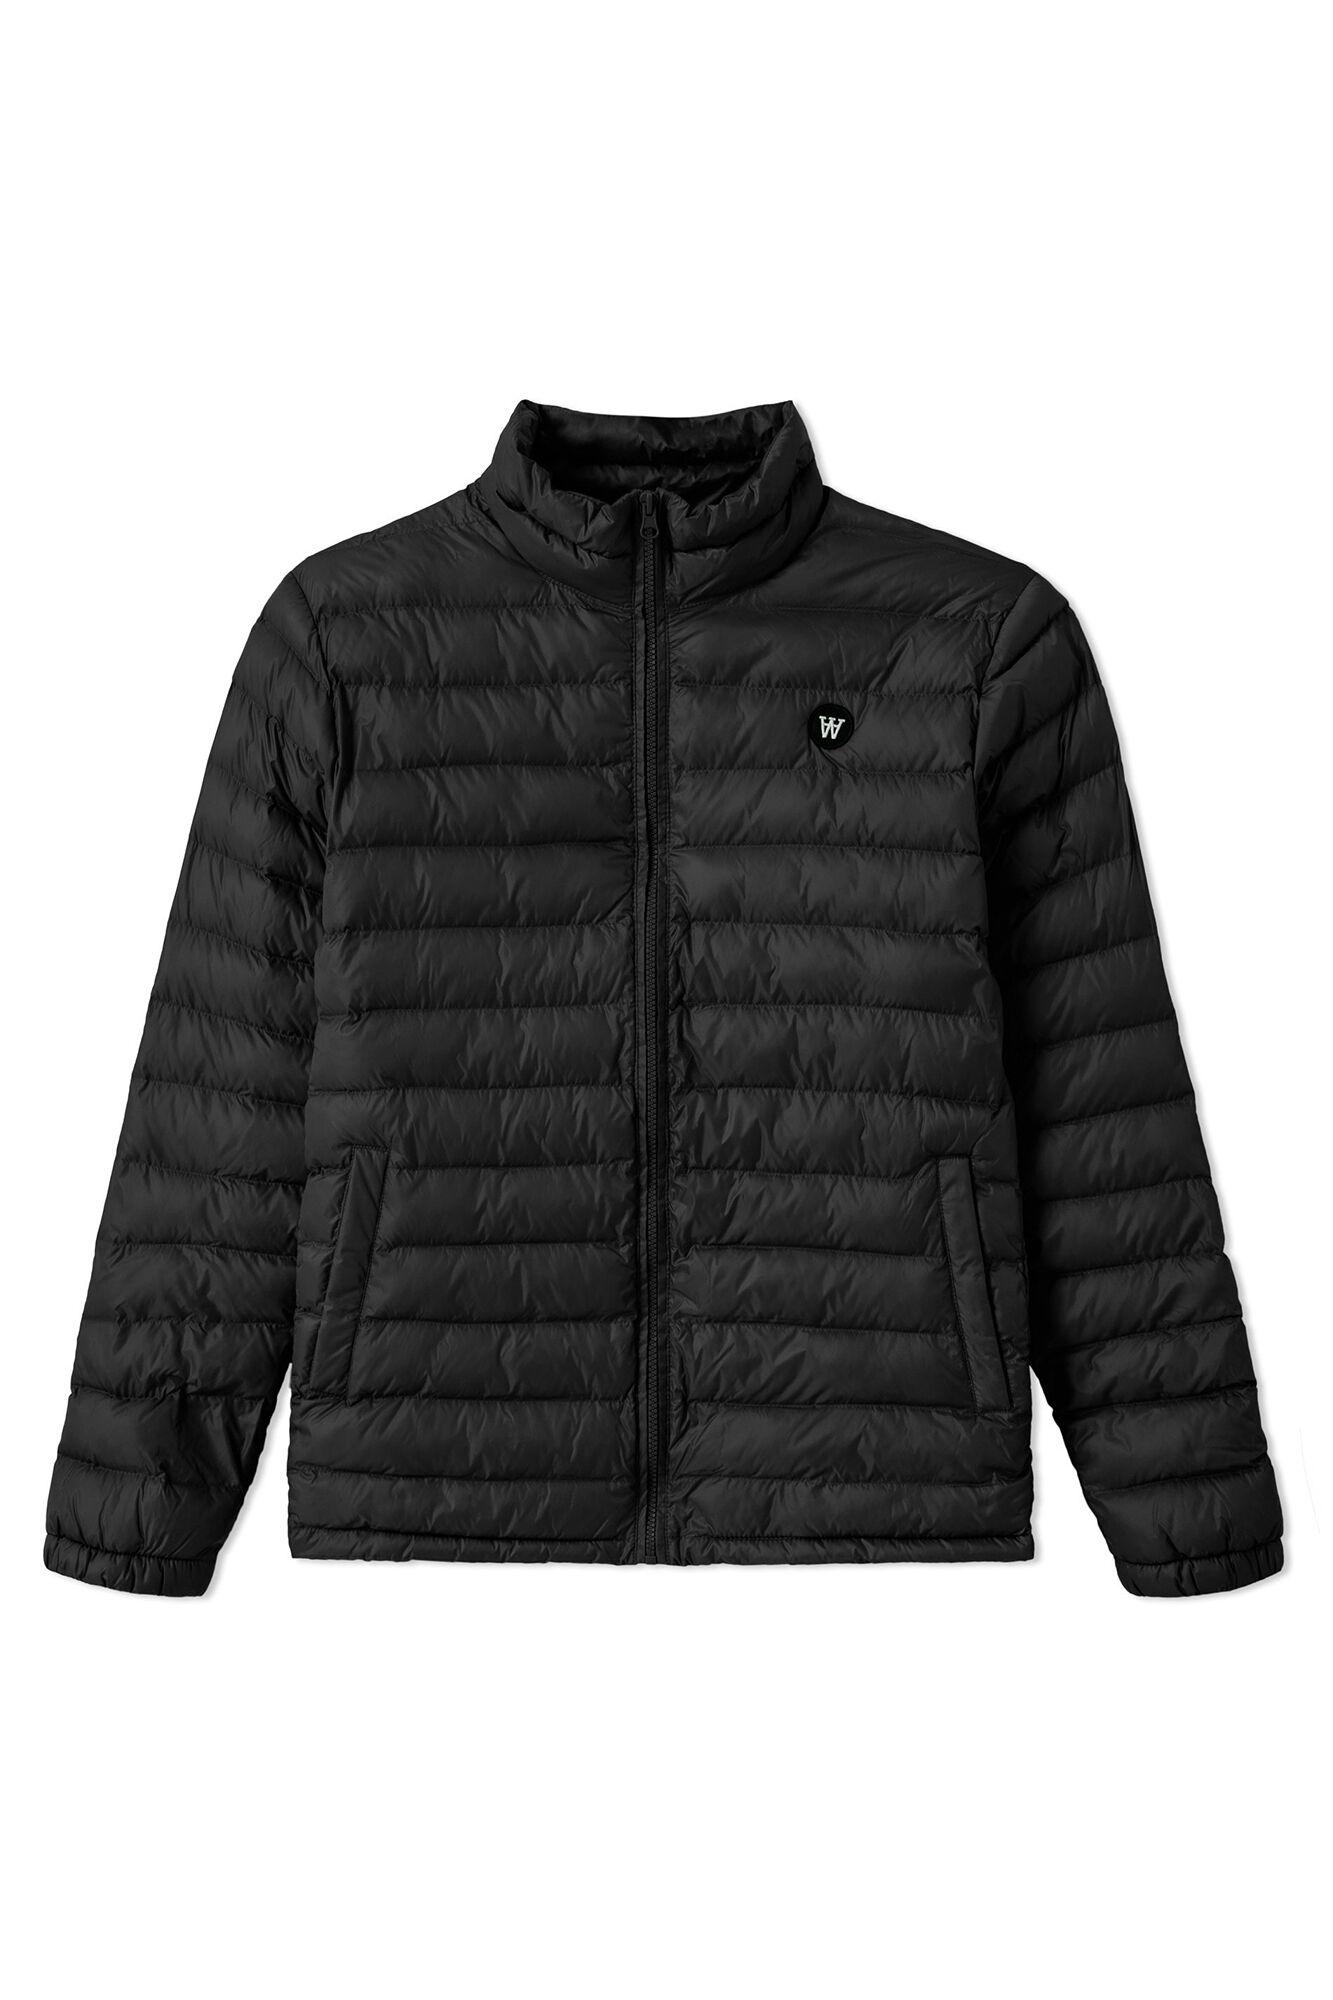 Alba Jacket 10832101-1146